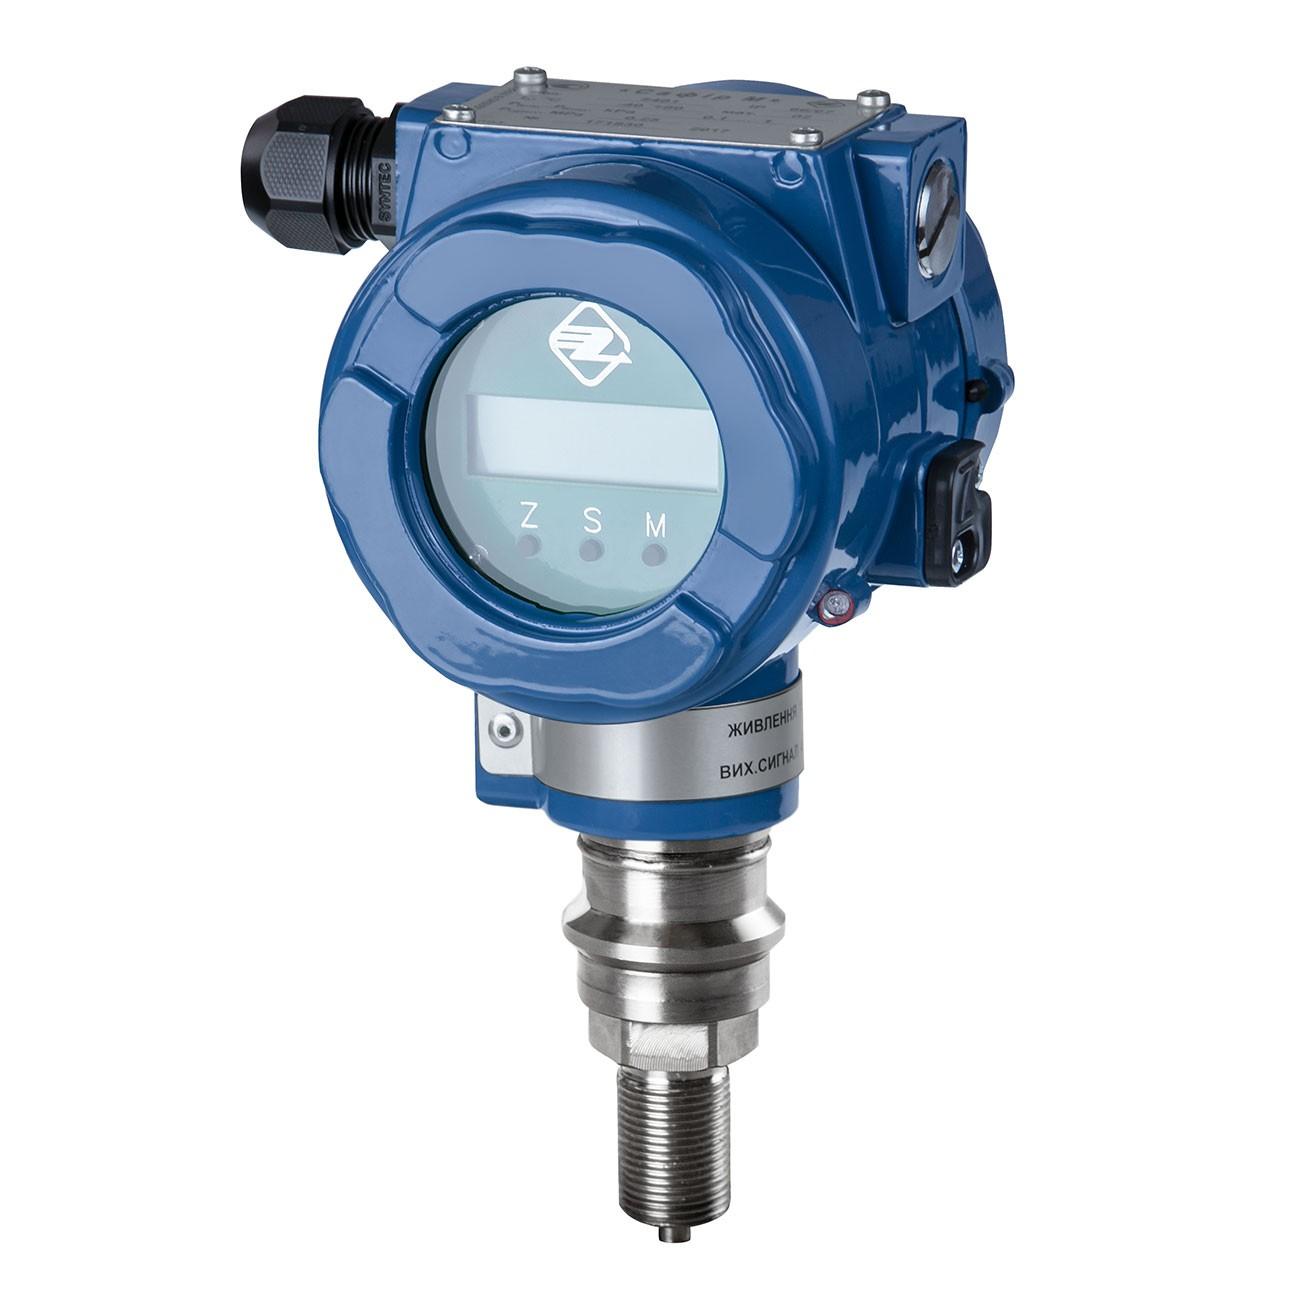 Absolute pressure transmitters Safir-M 5030, 5040, 5050